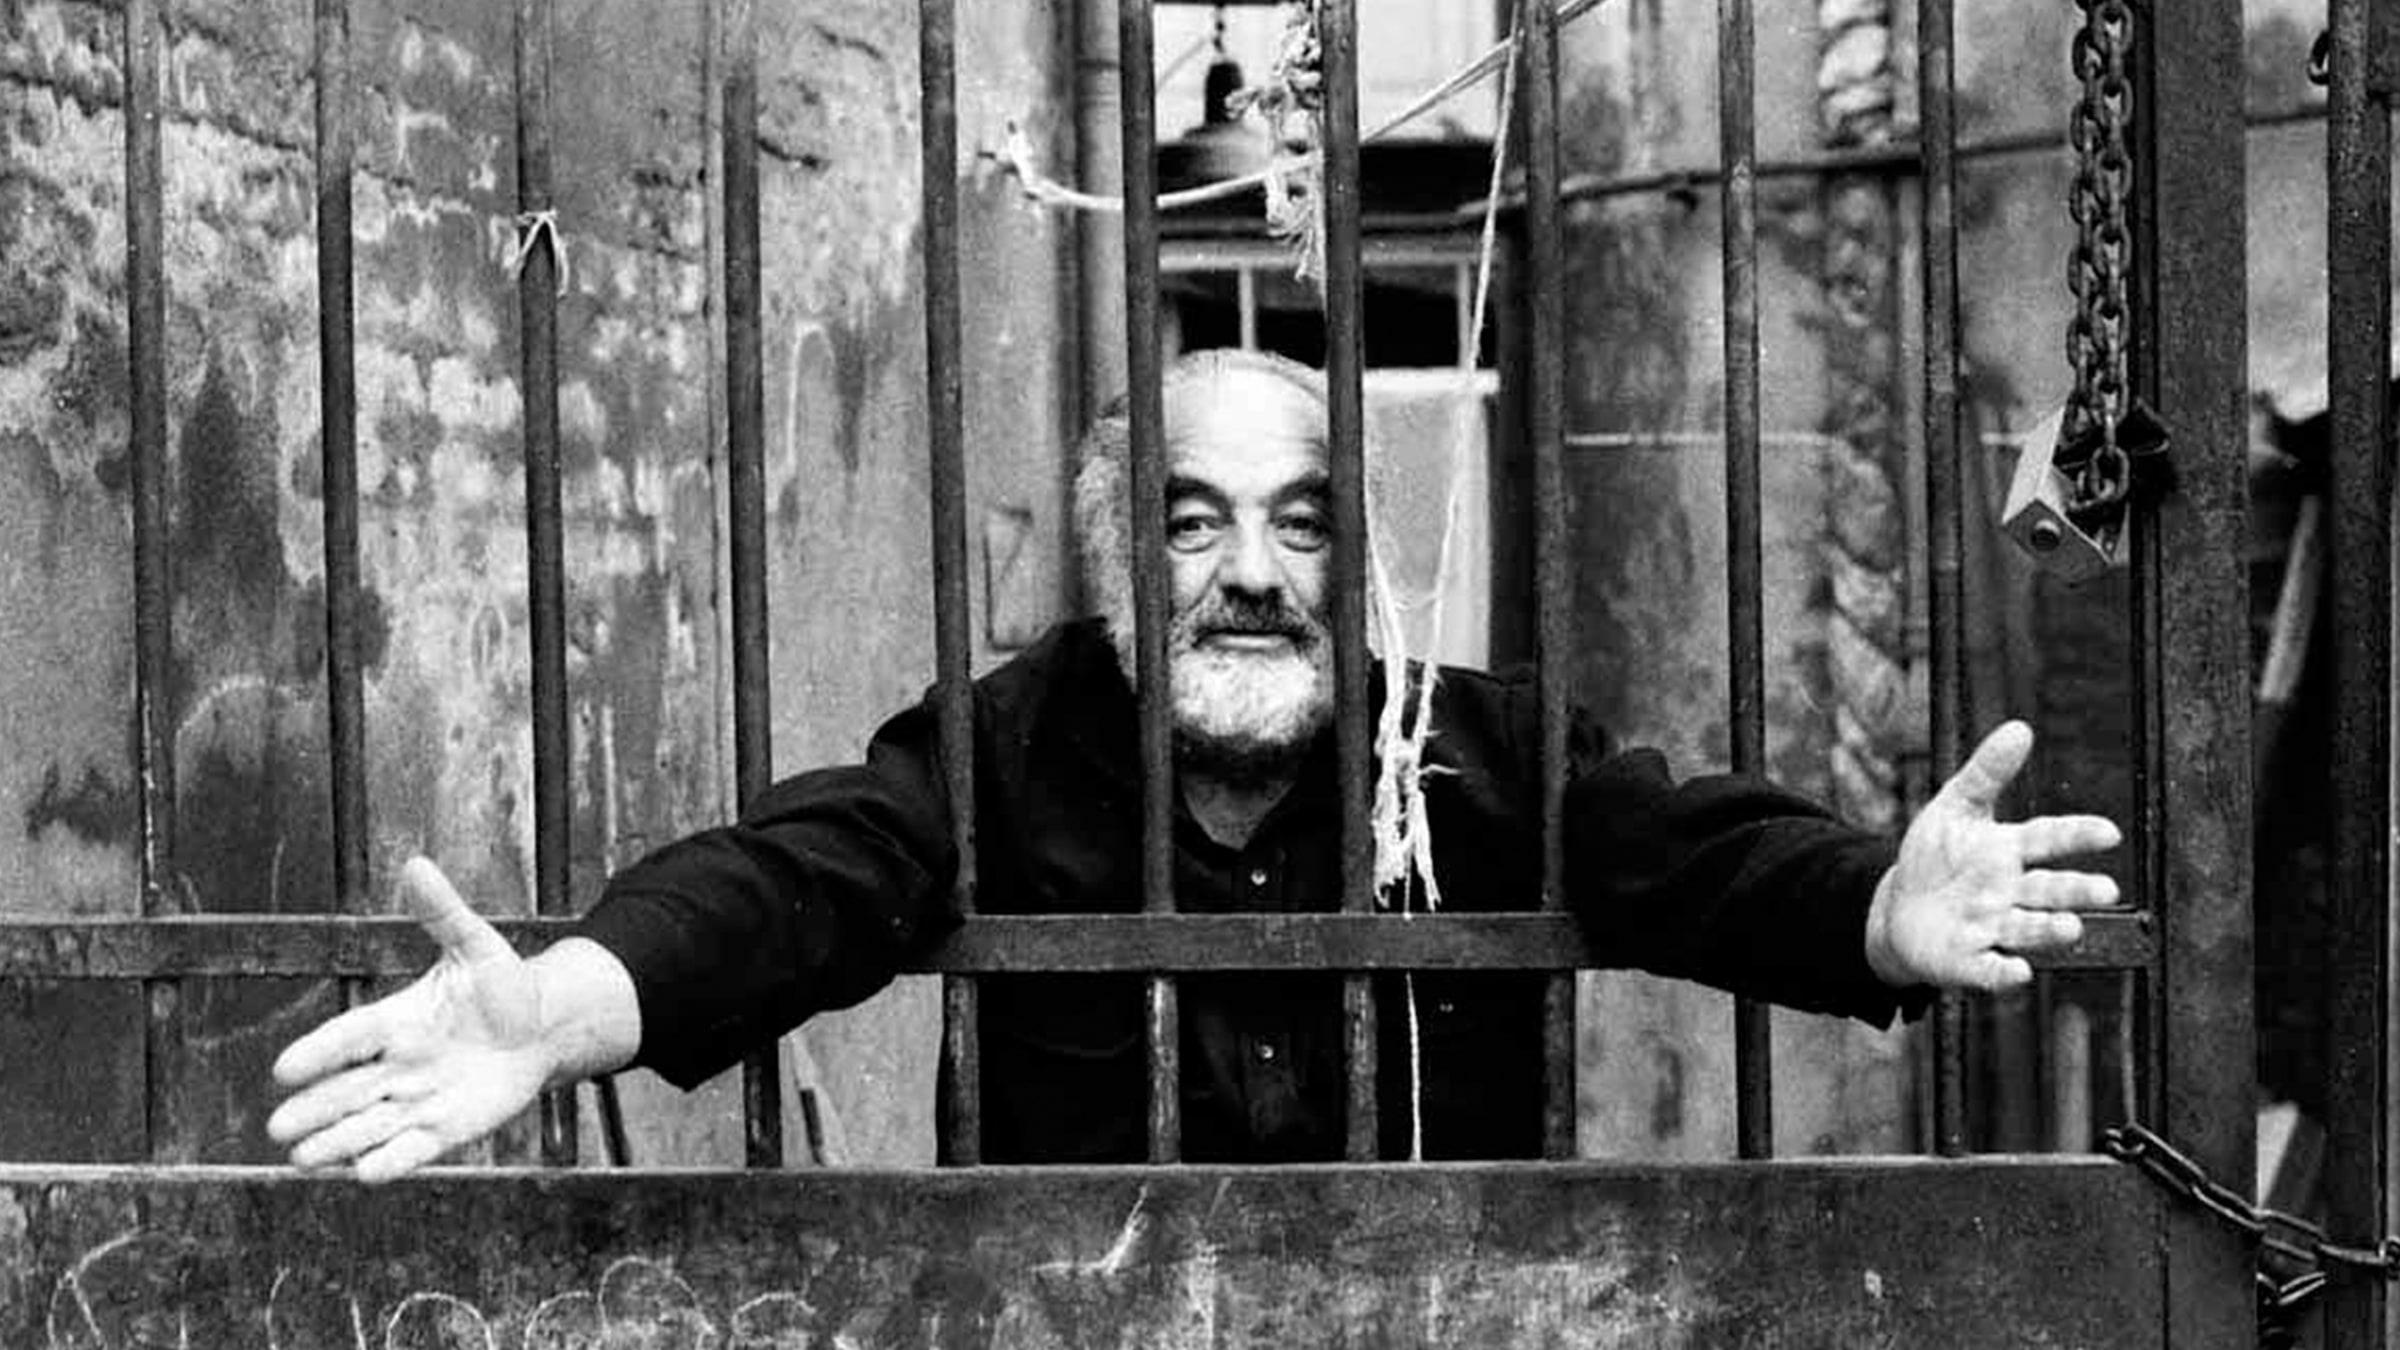 İsyankar İmgeler<br> Sergey Parajanov